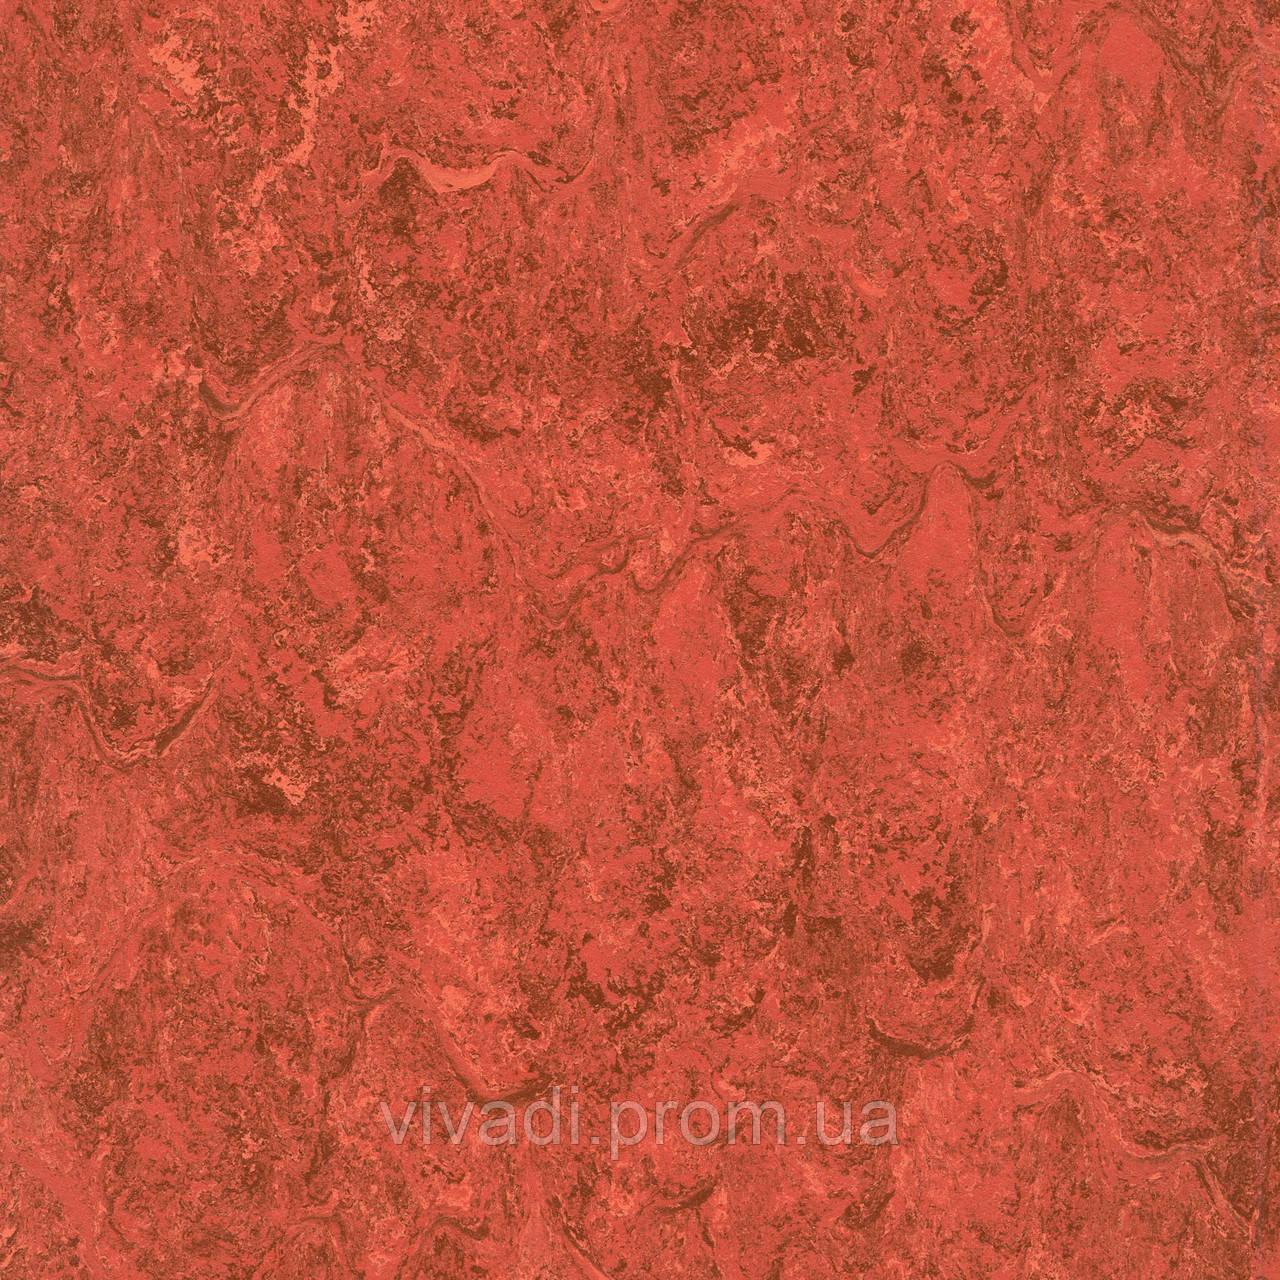 Натуральний лінолеум Marmorette LPX - 121-048 cranberry red